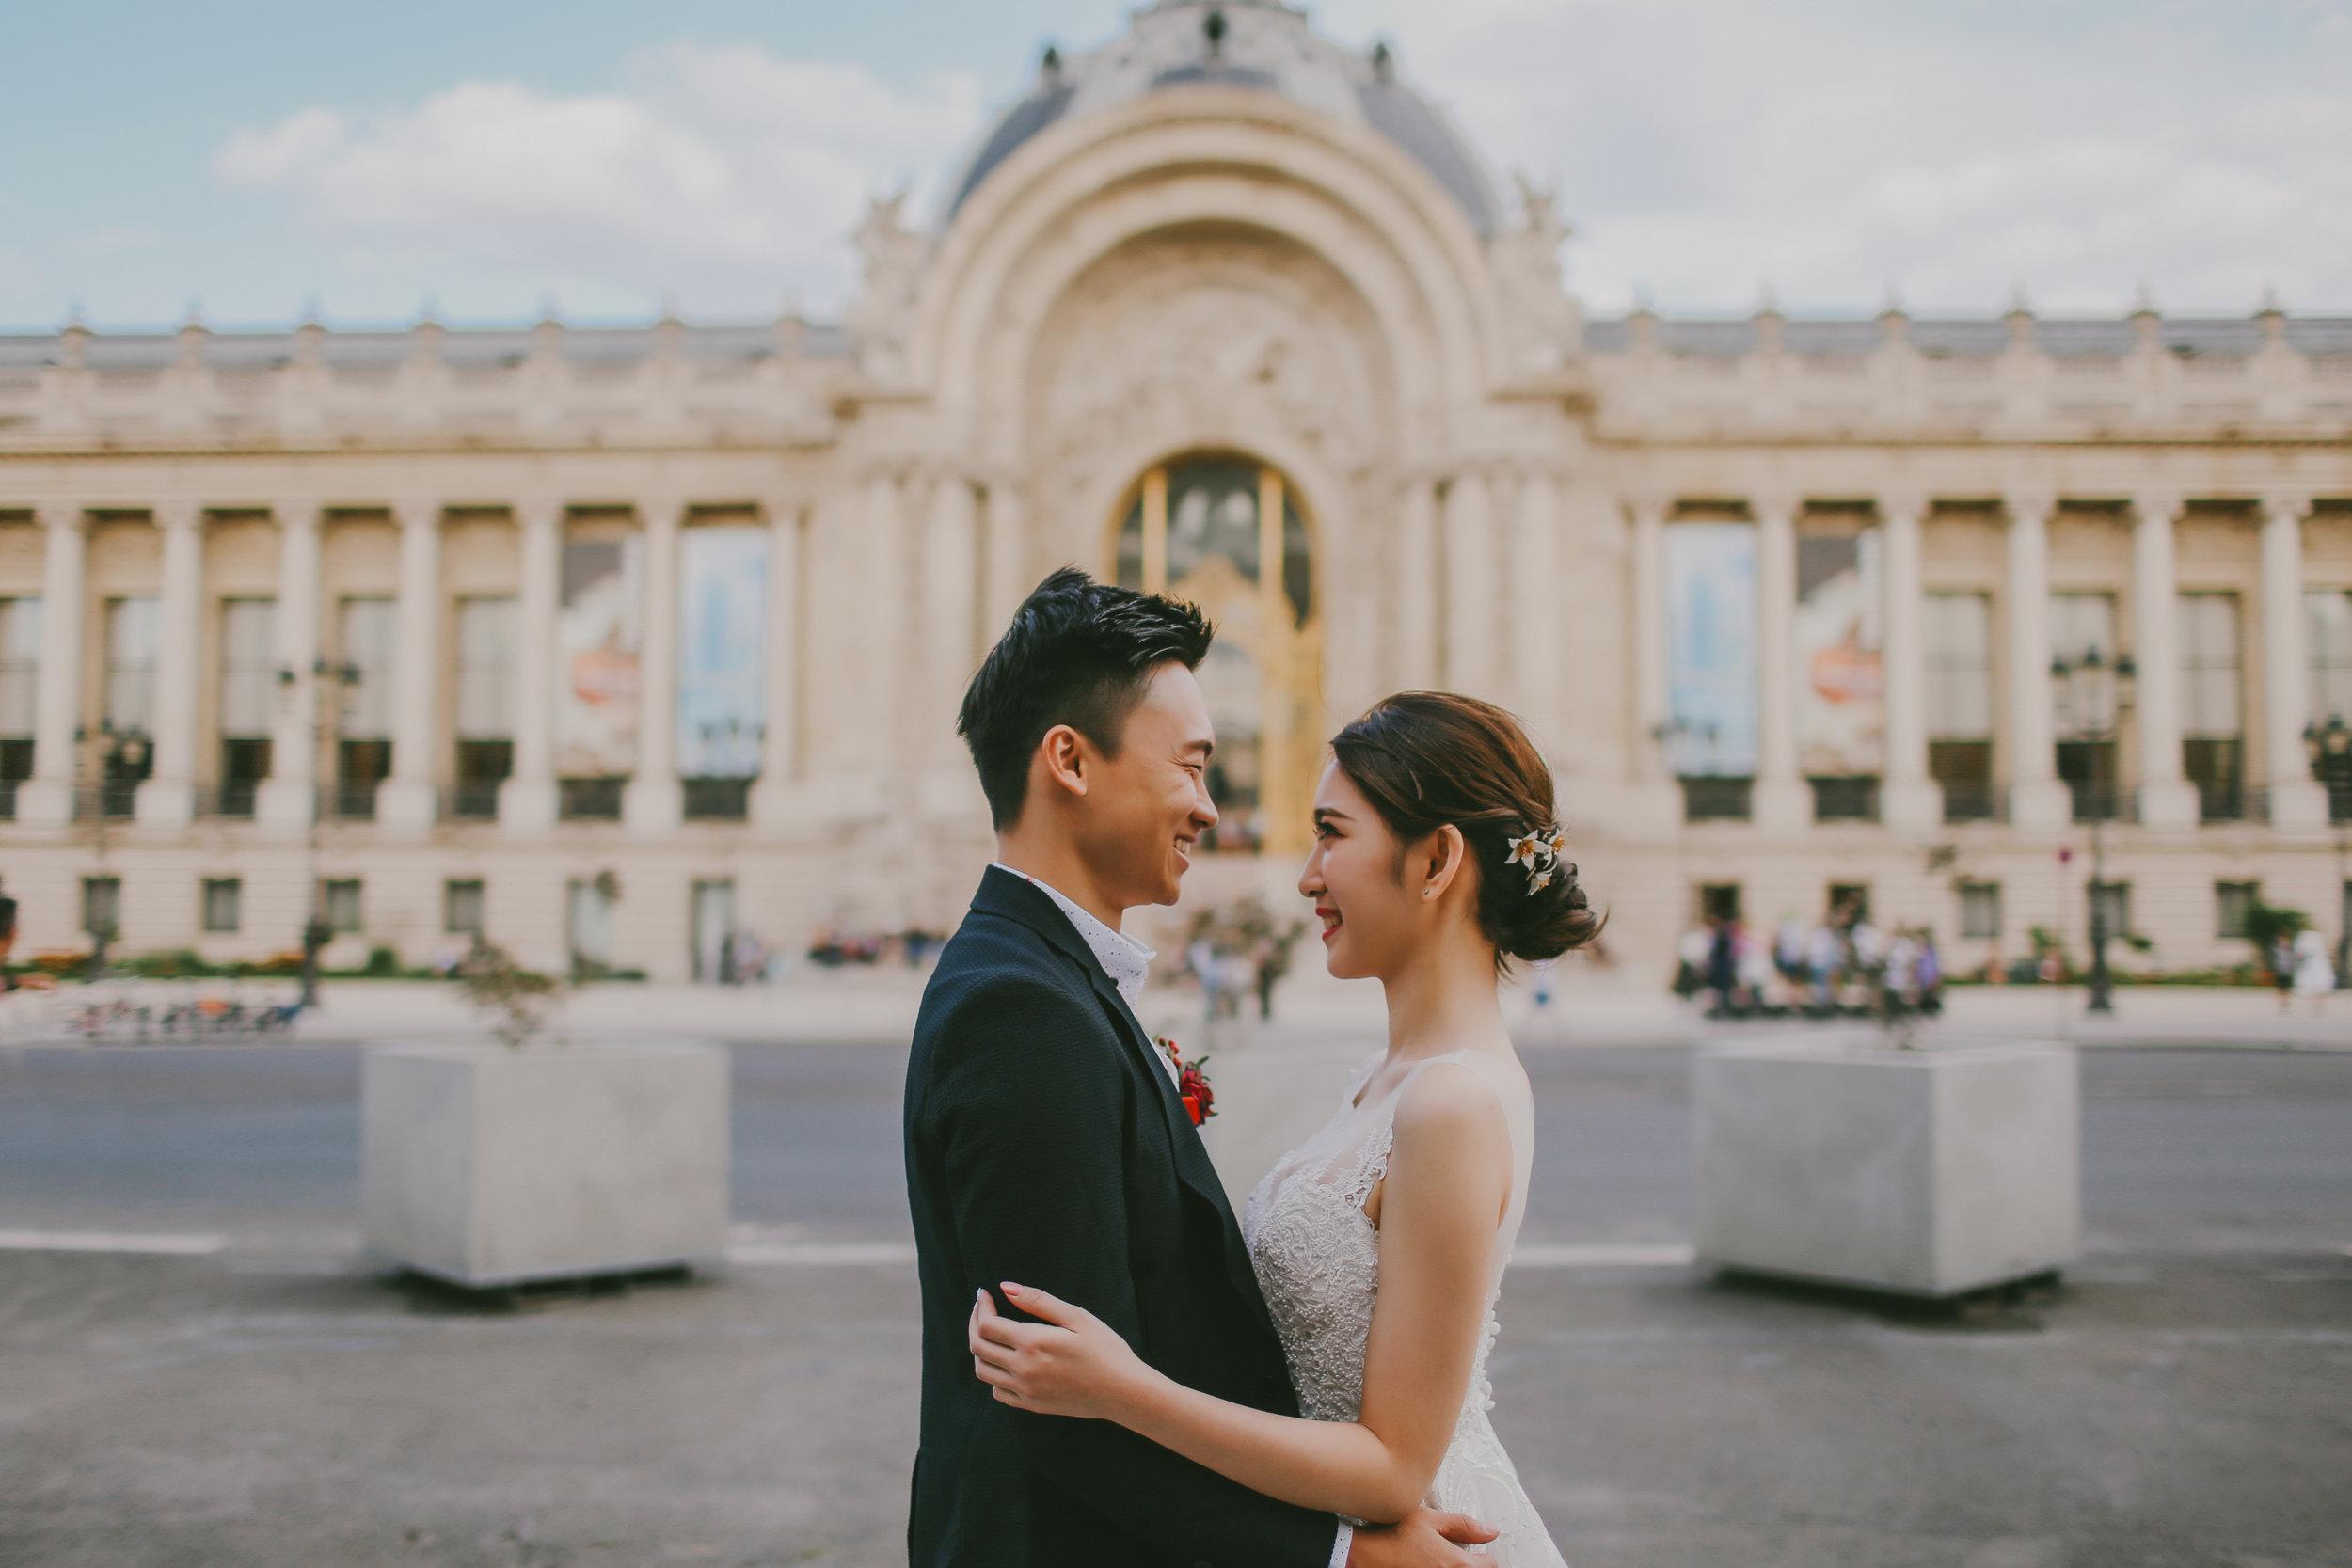 2018-pre-wedding-studio-numb9r-paris-high-1839e.jpg